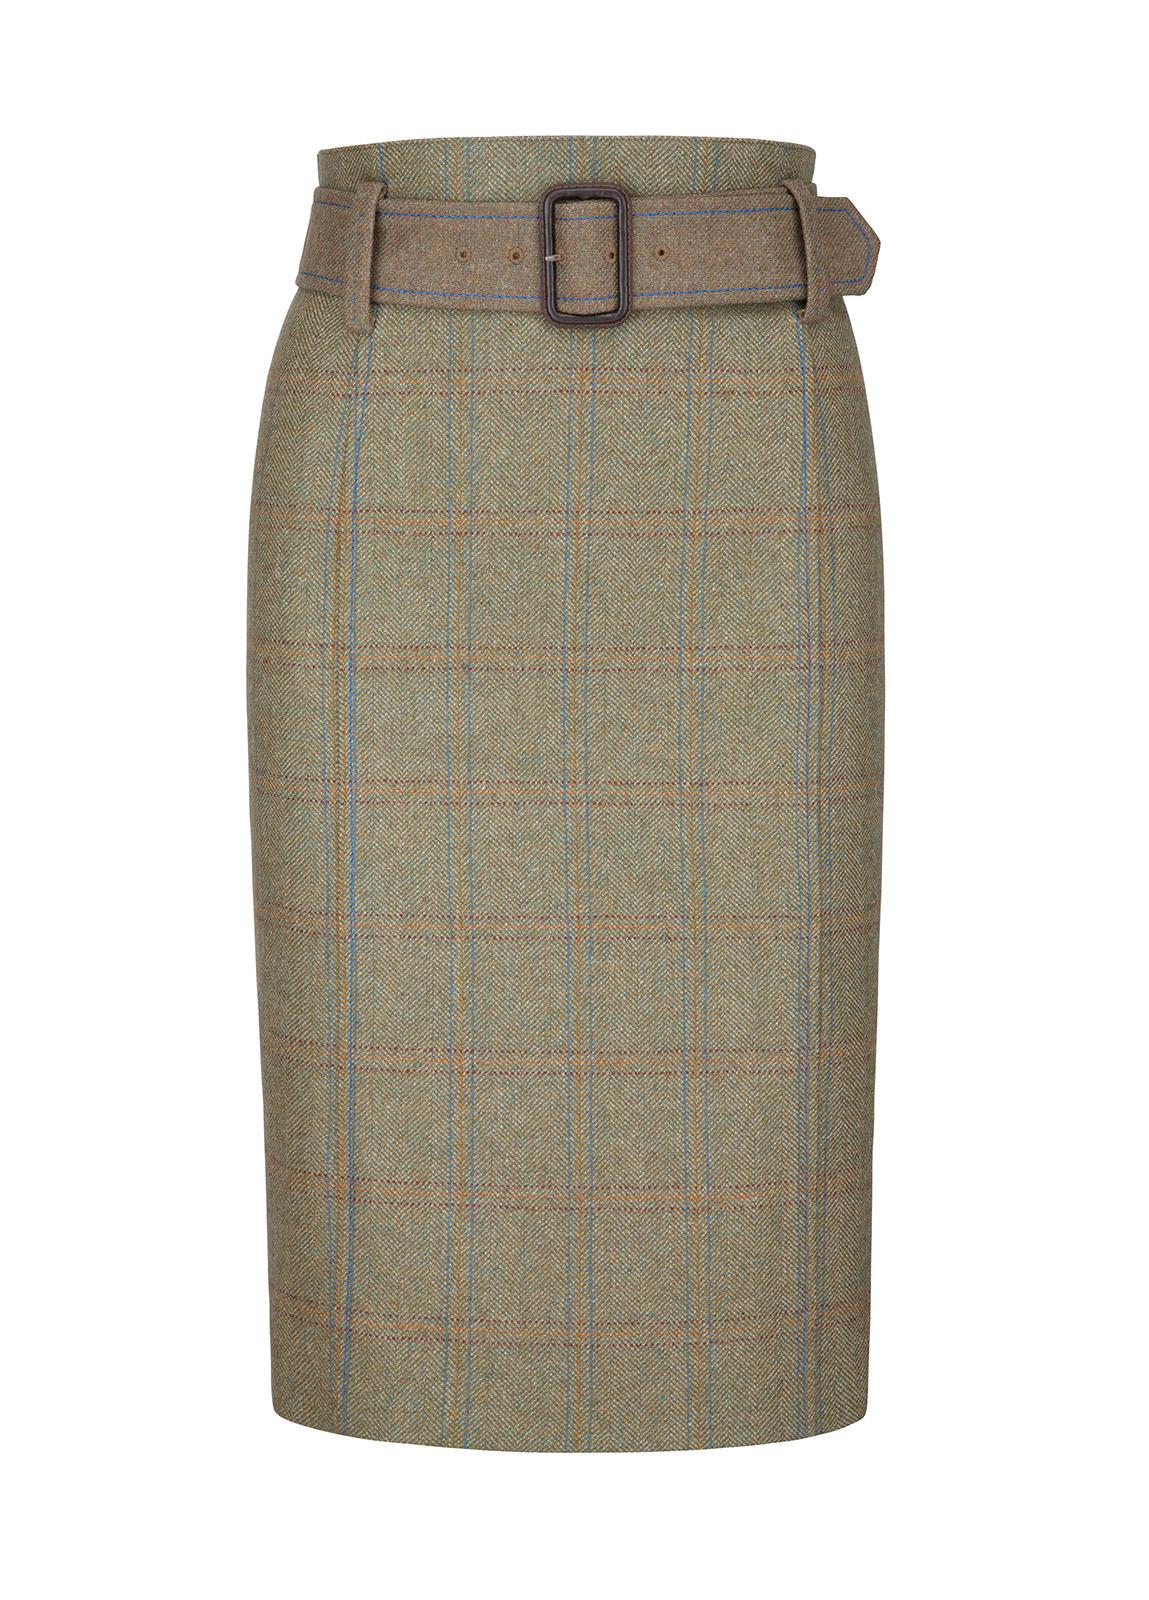 Dubarry_Arrowgrass Knee Length Tweed Skirt - Black/Brown_Image_2